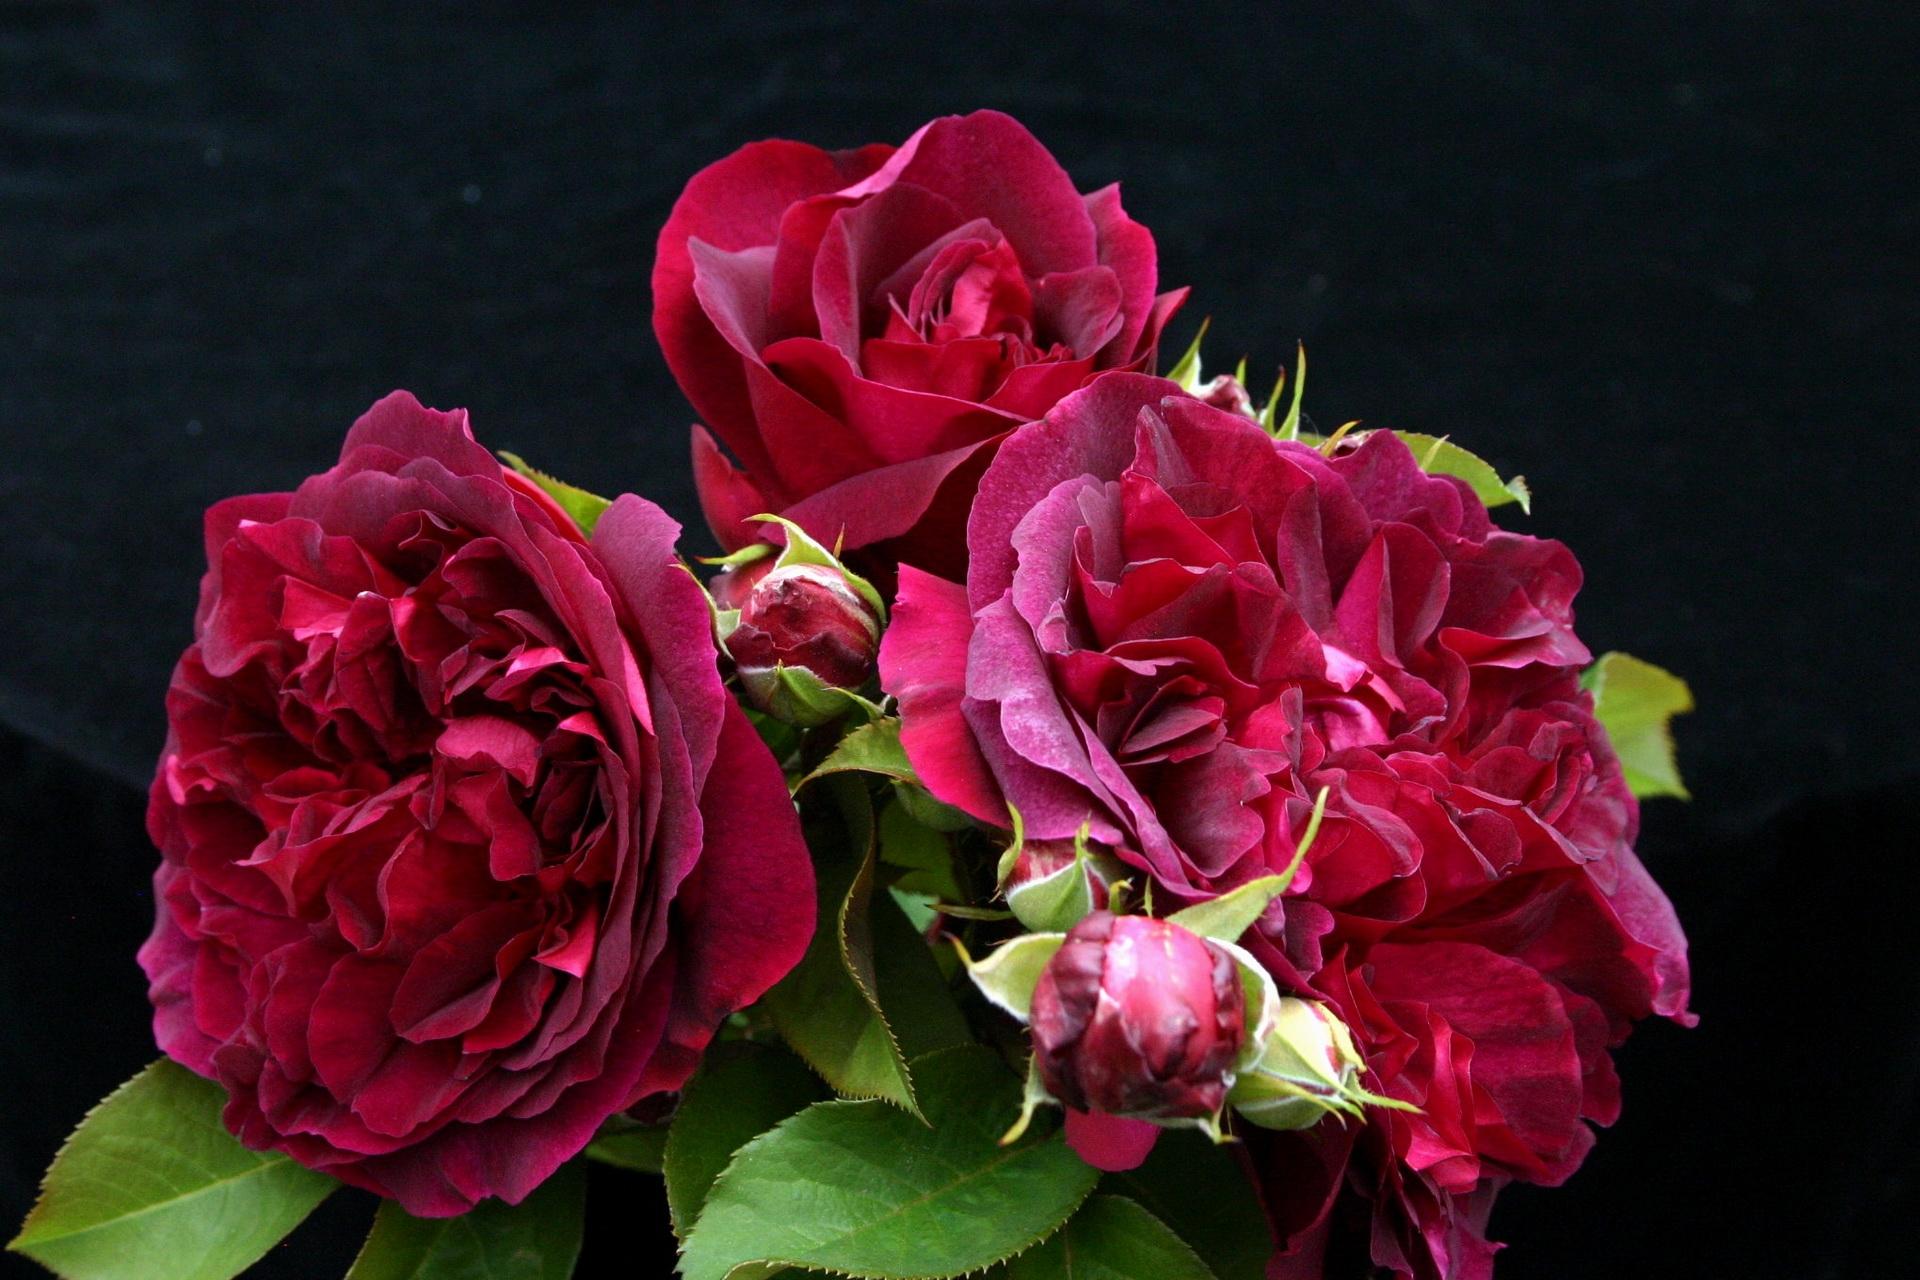 120117 descargar fondo de pantalla Flores, Roses, Hojas, Ramo, Cogollos, Brotes, Tres: protectores de pantalla e imágenes gratis